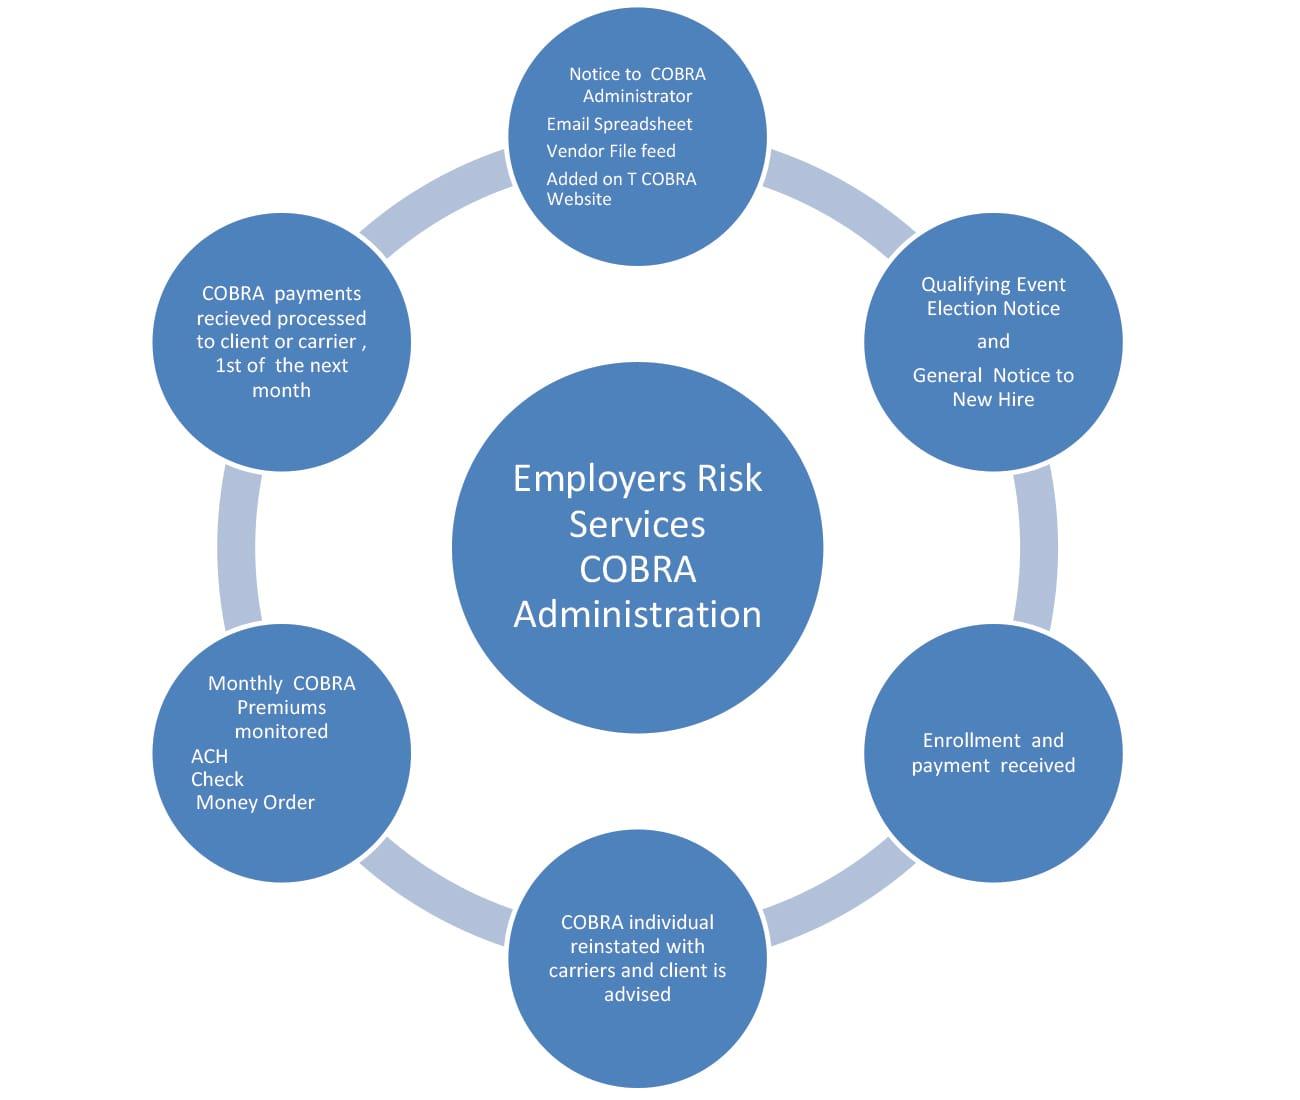 COBRA Administration Procedure Circle